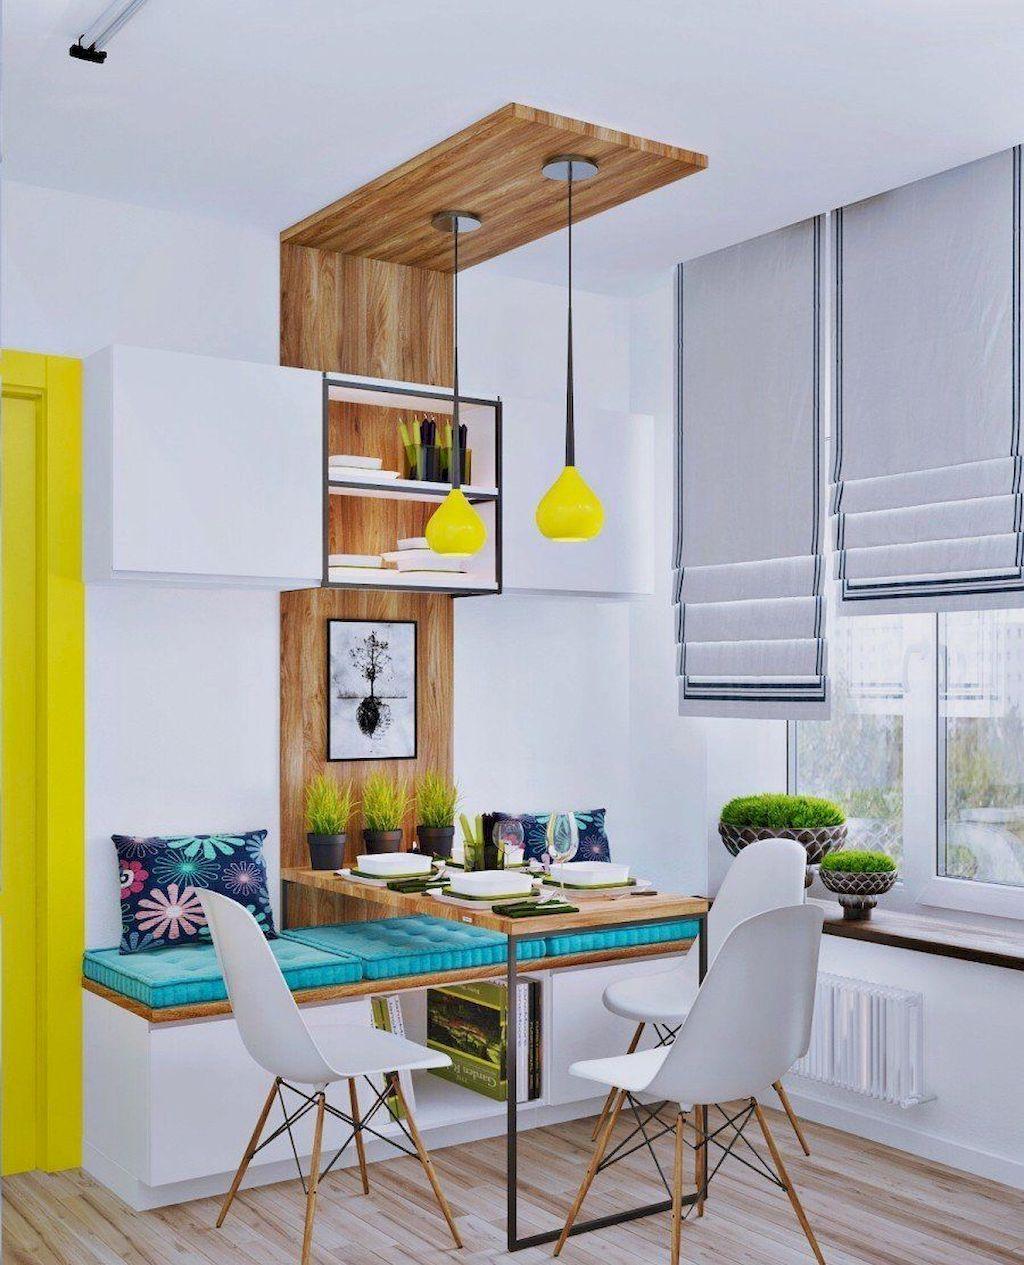 75 Beautiful Small Dining Room Design Ideas - spaciroom ...